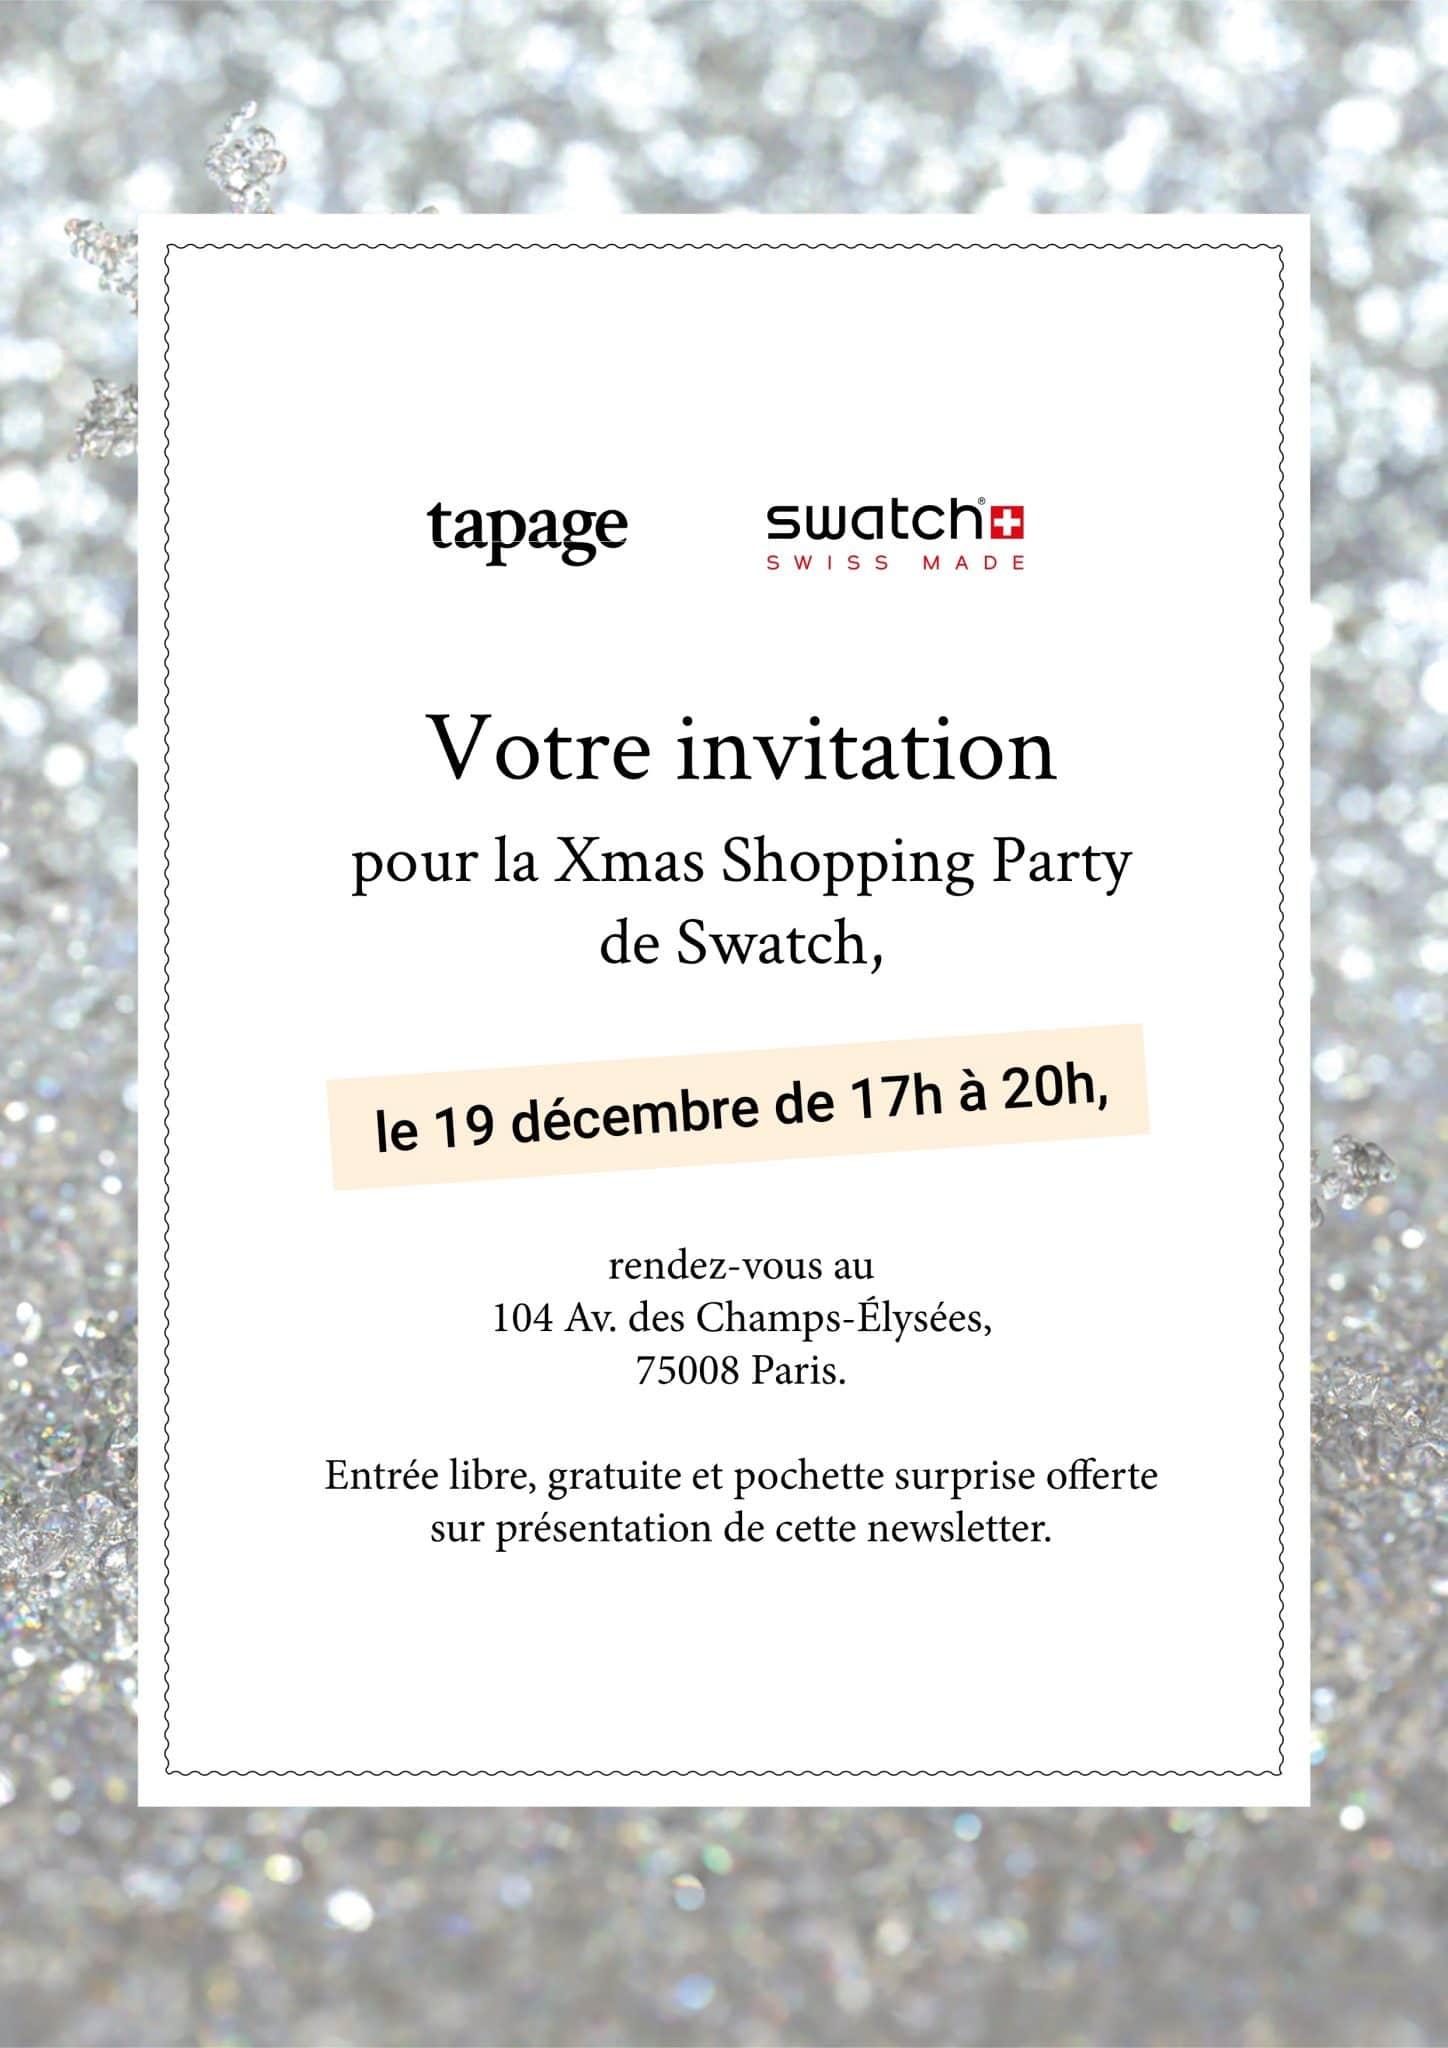 invitation scaled